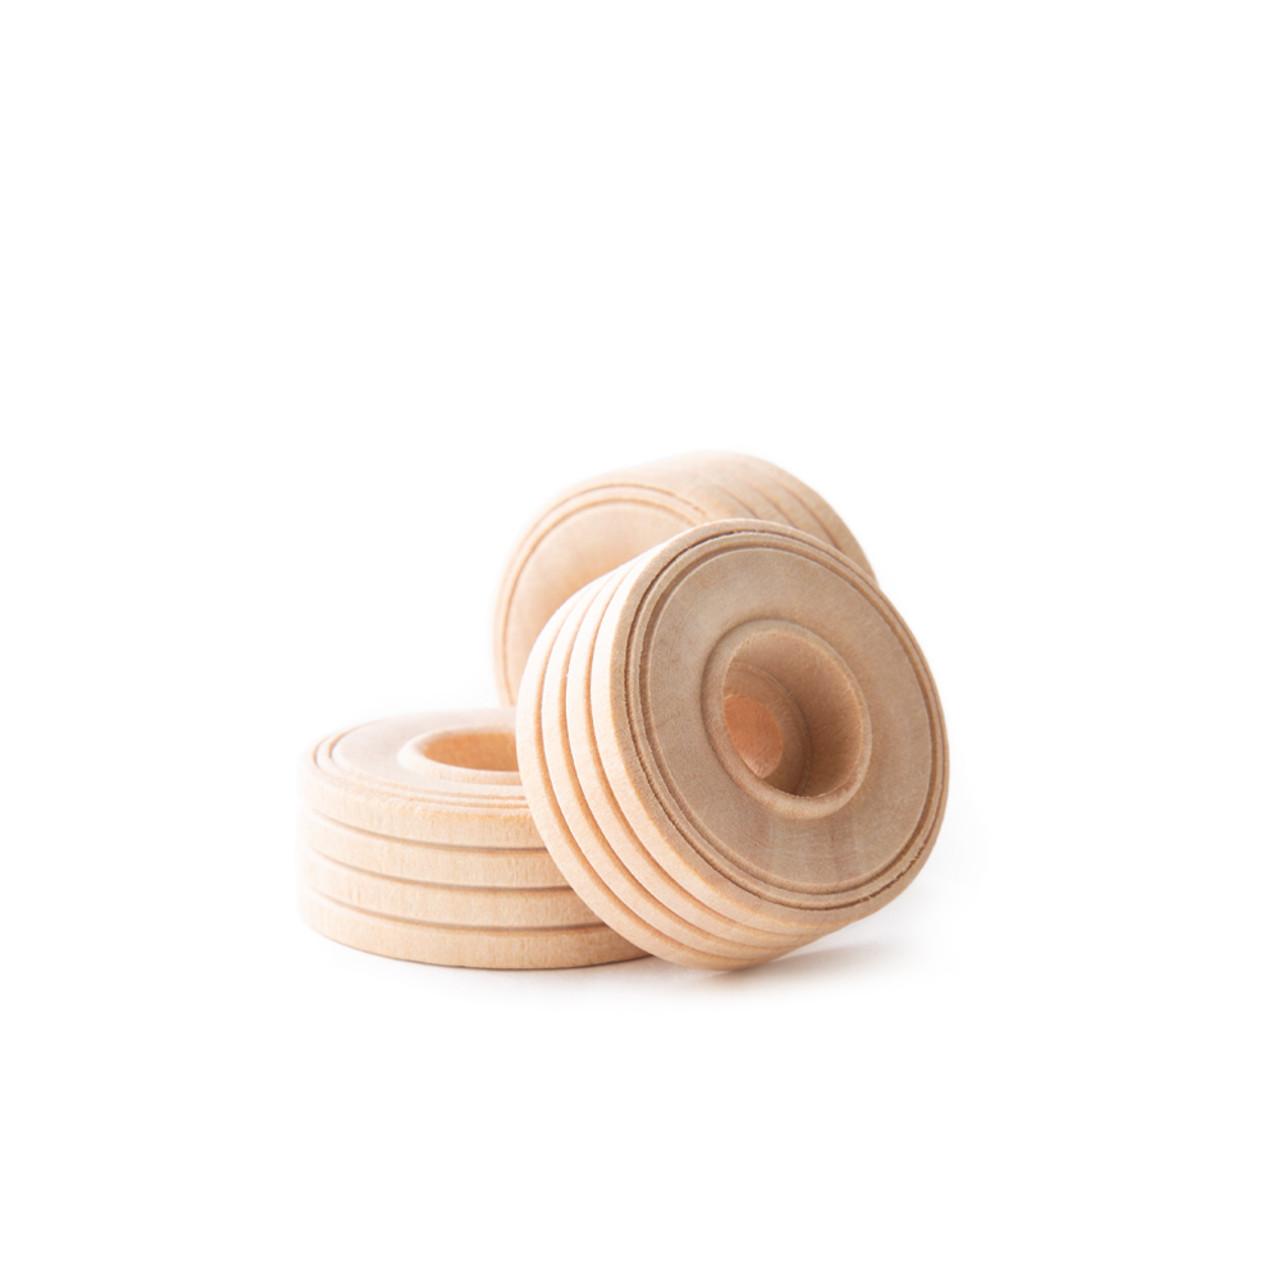 1-1/4 Inch Treaded Toy Wheels